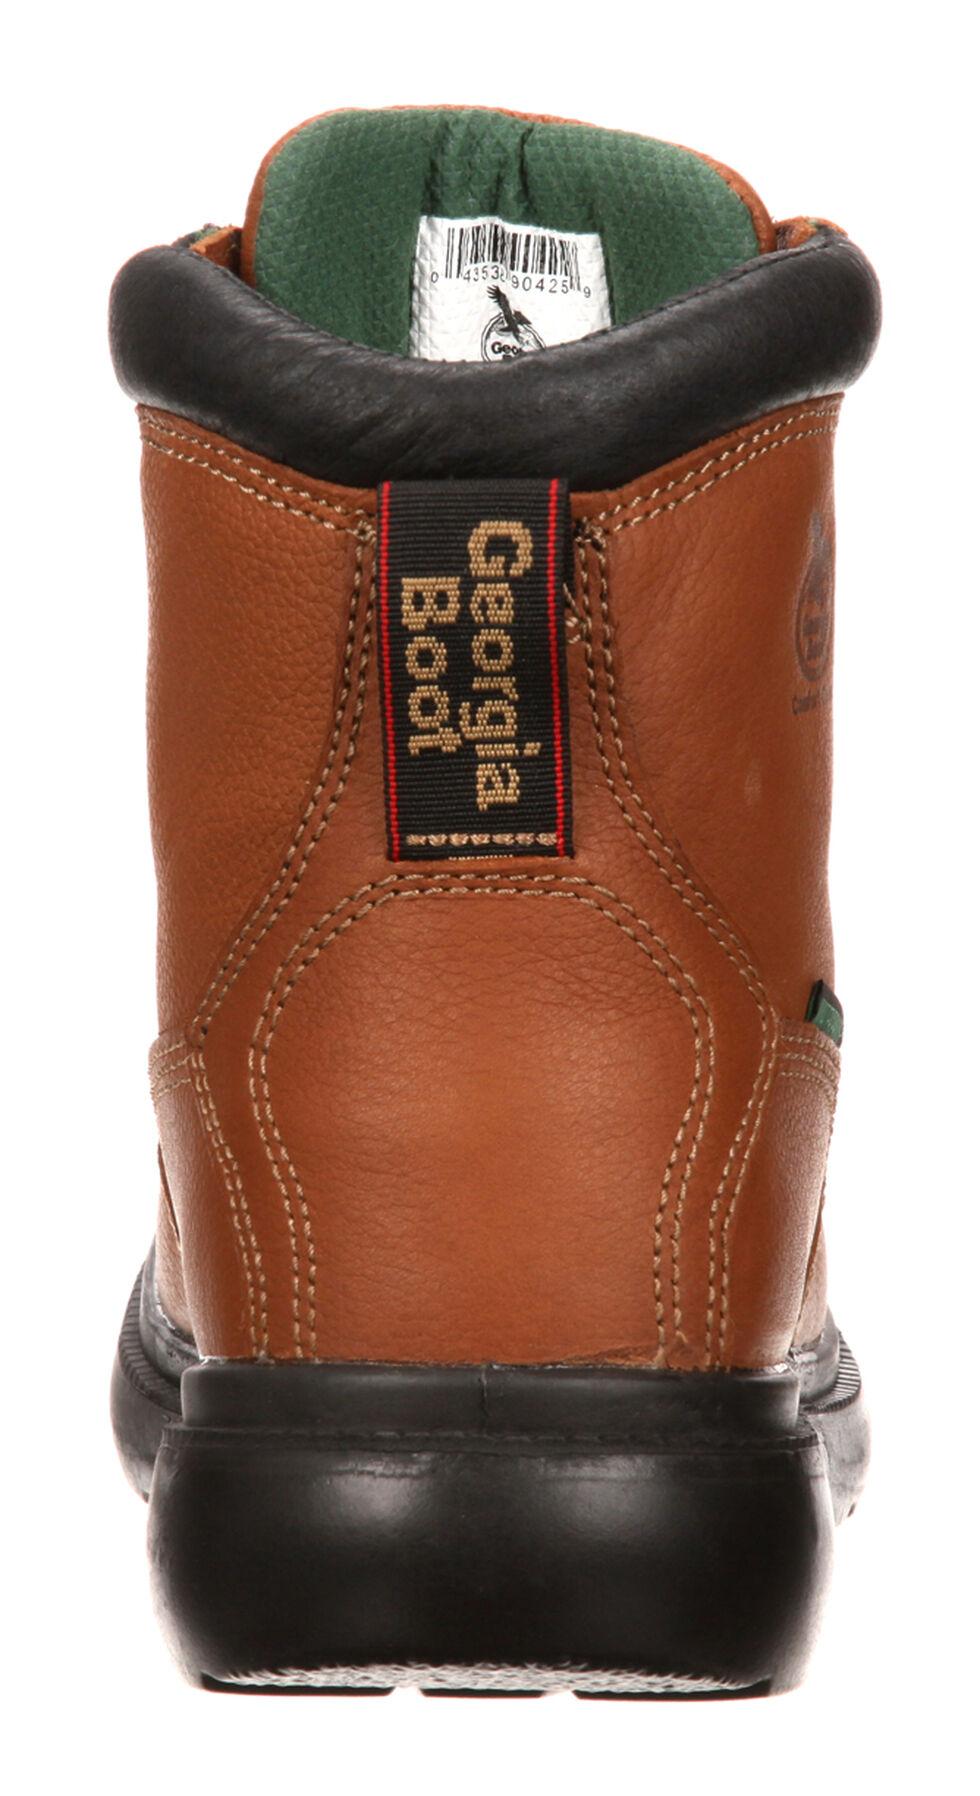 Georgia Farm and Ranch Waterproof Boots, Briar, hi-res